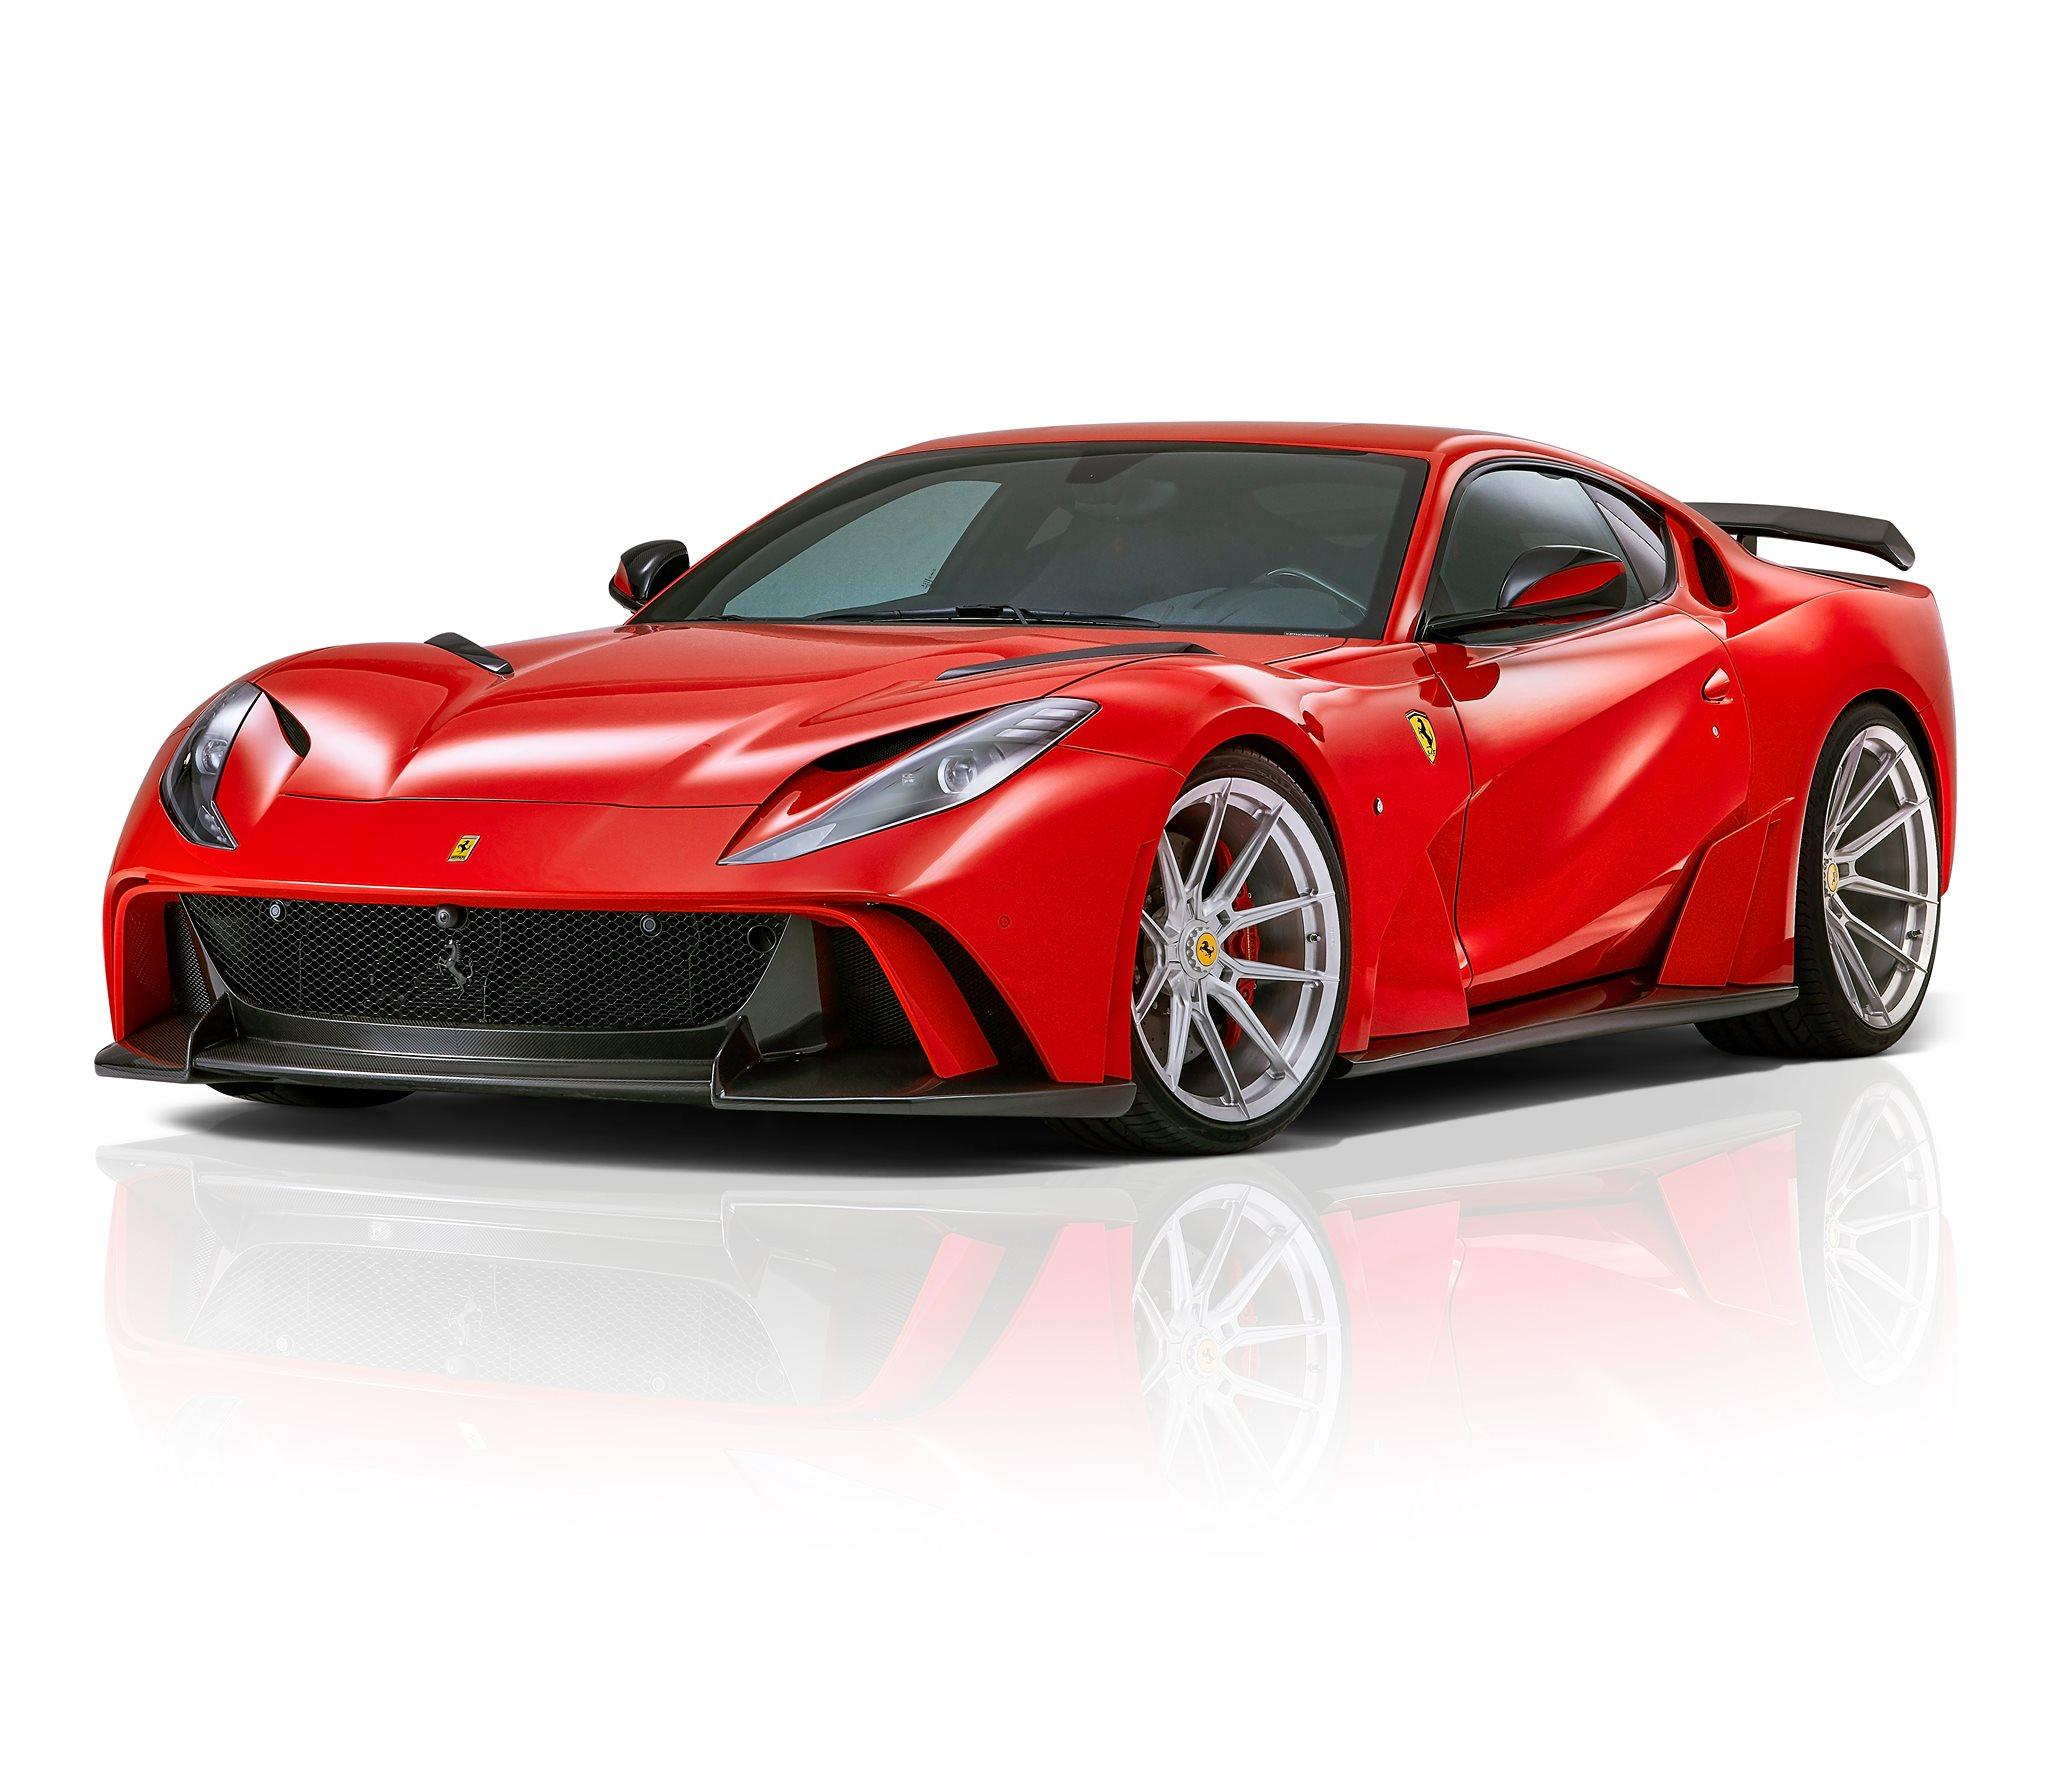 Ferrari-812-Superfast-N-Largo-by-Novitec-22